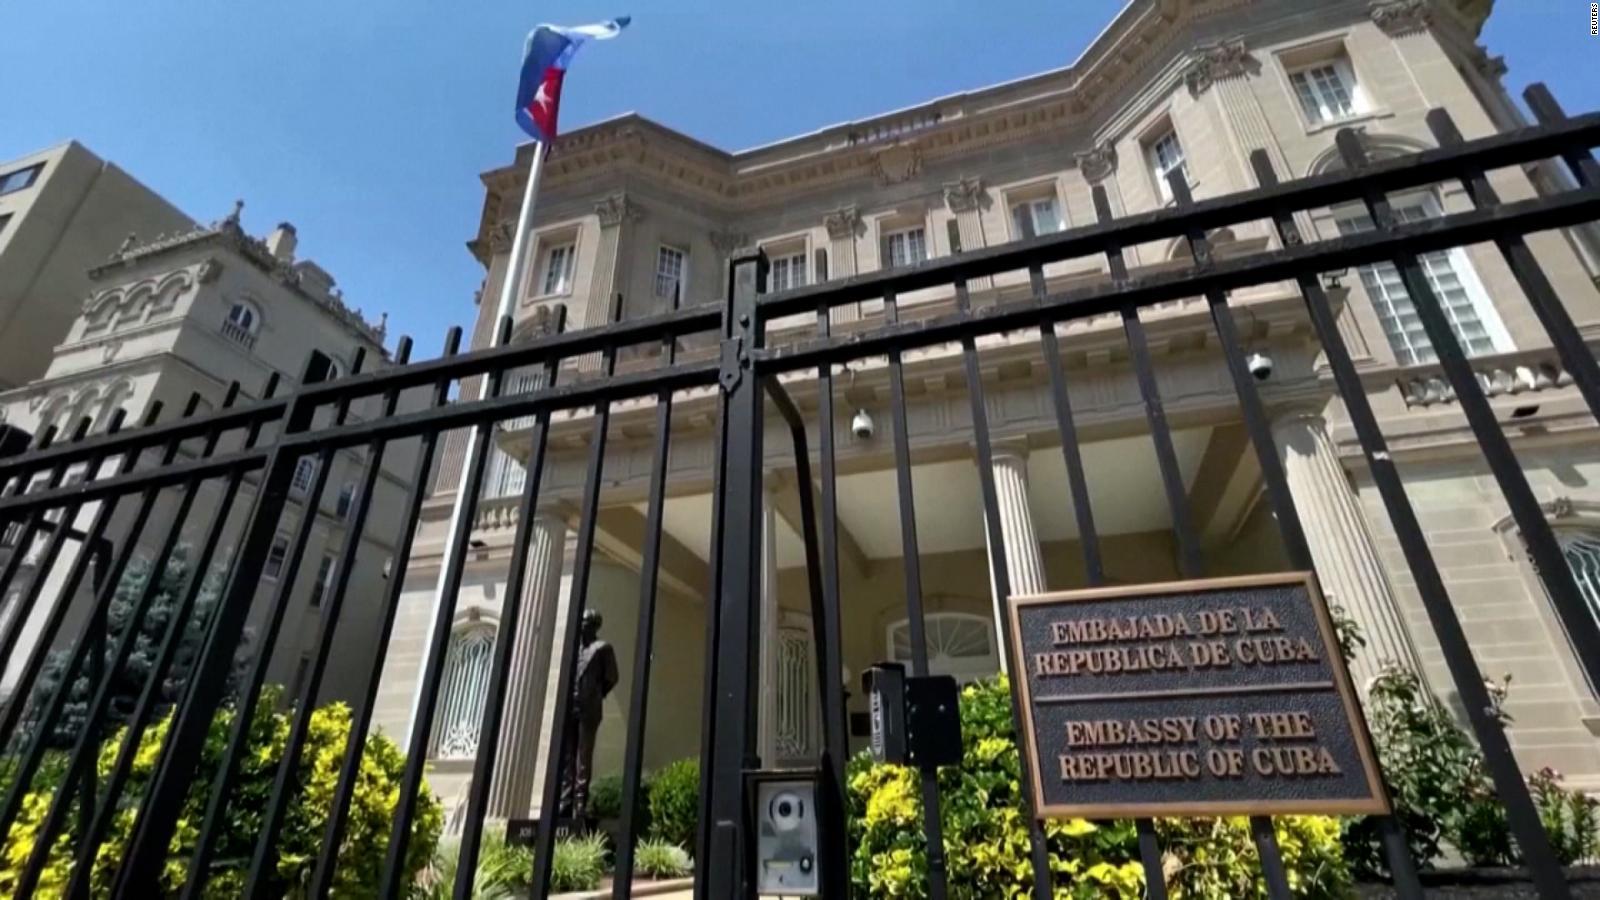 Pintan un gigantesco mural frente a la embajada de Cuba en EE.UU. | Video